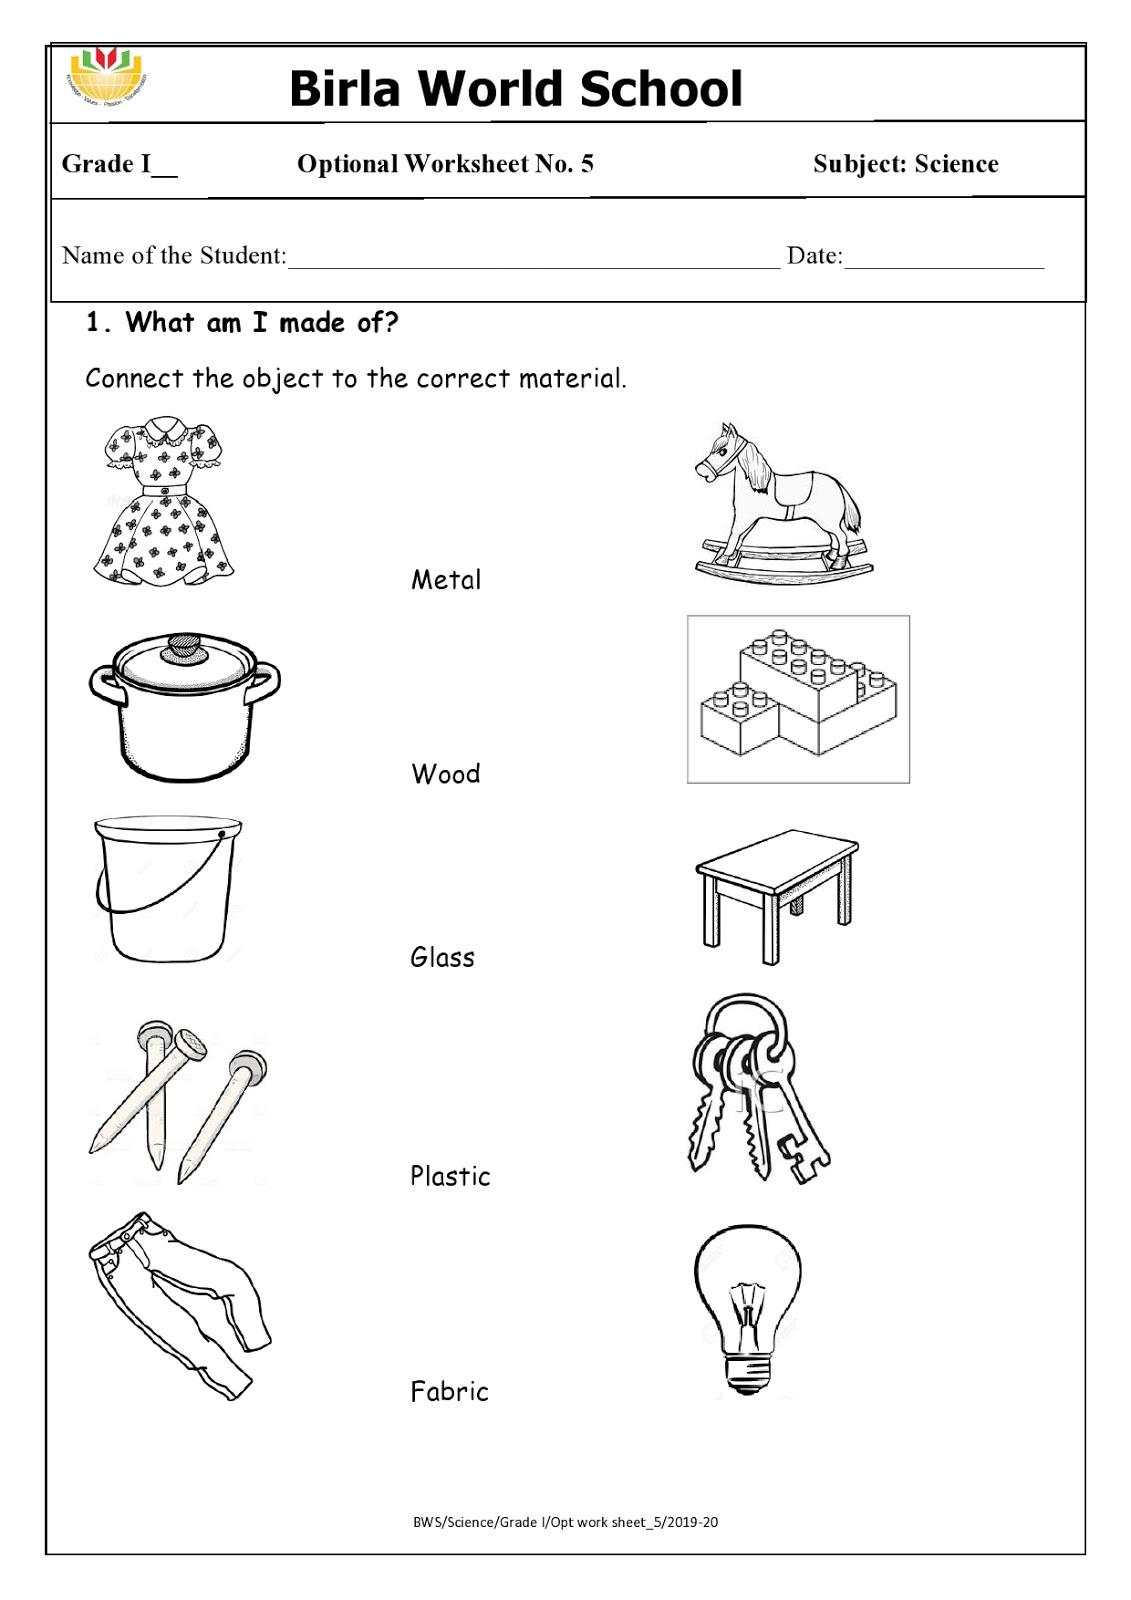 WORLD SCHOOL OMAN: Homework for Grade 1 as on 18-02-2020 [ 1600 x 1131 Pixel ]